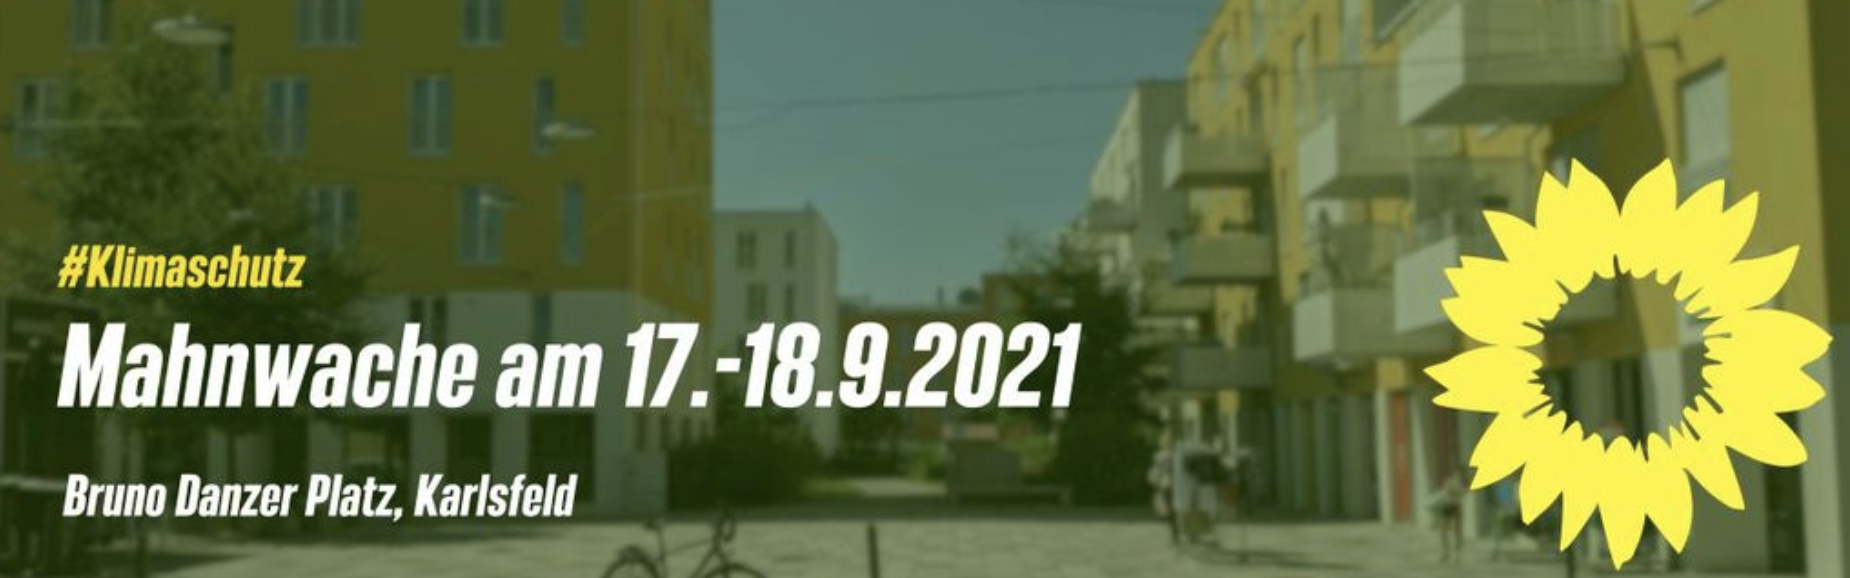 24h Klimaschutz-Mahnwache